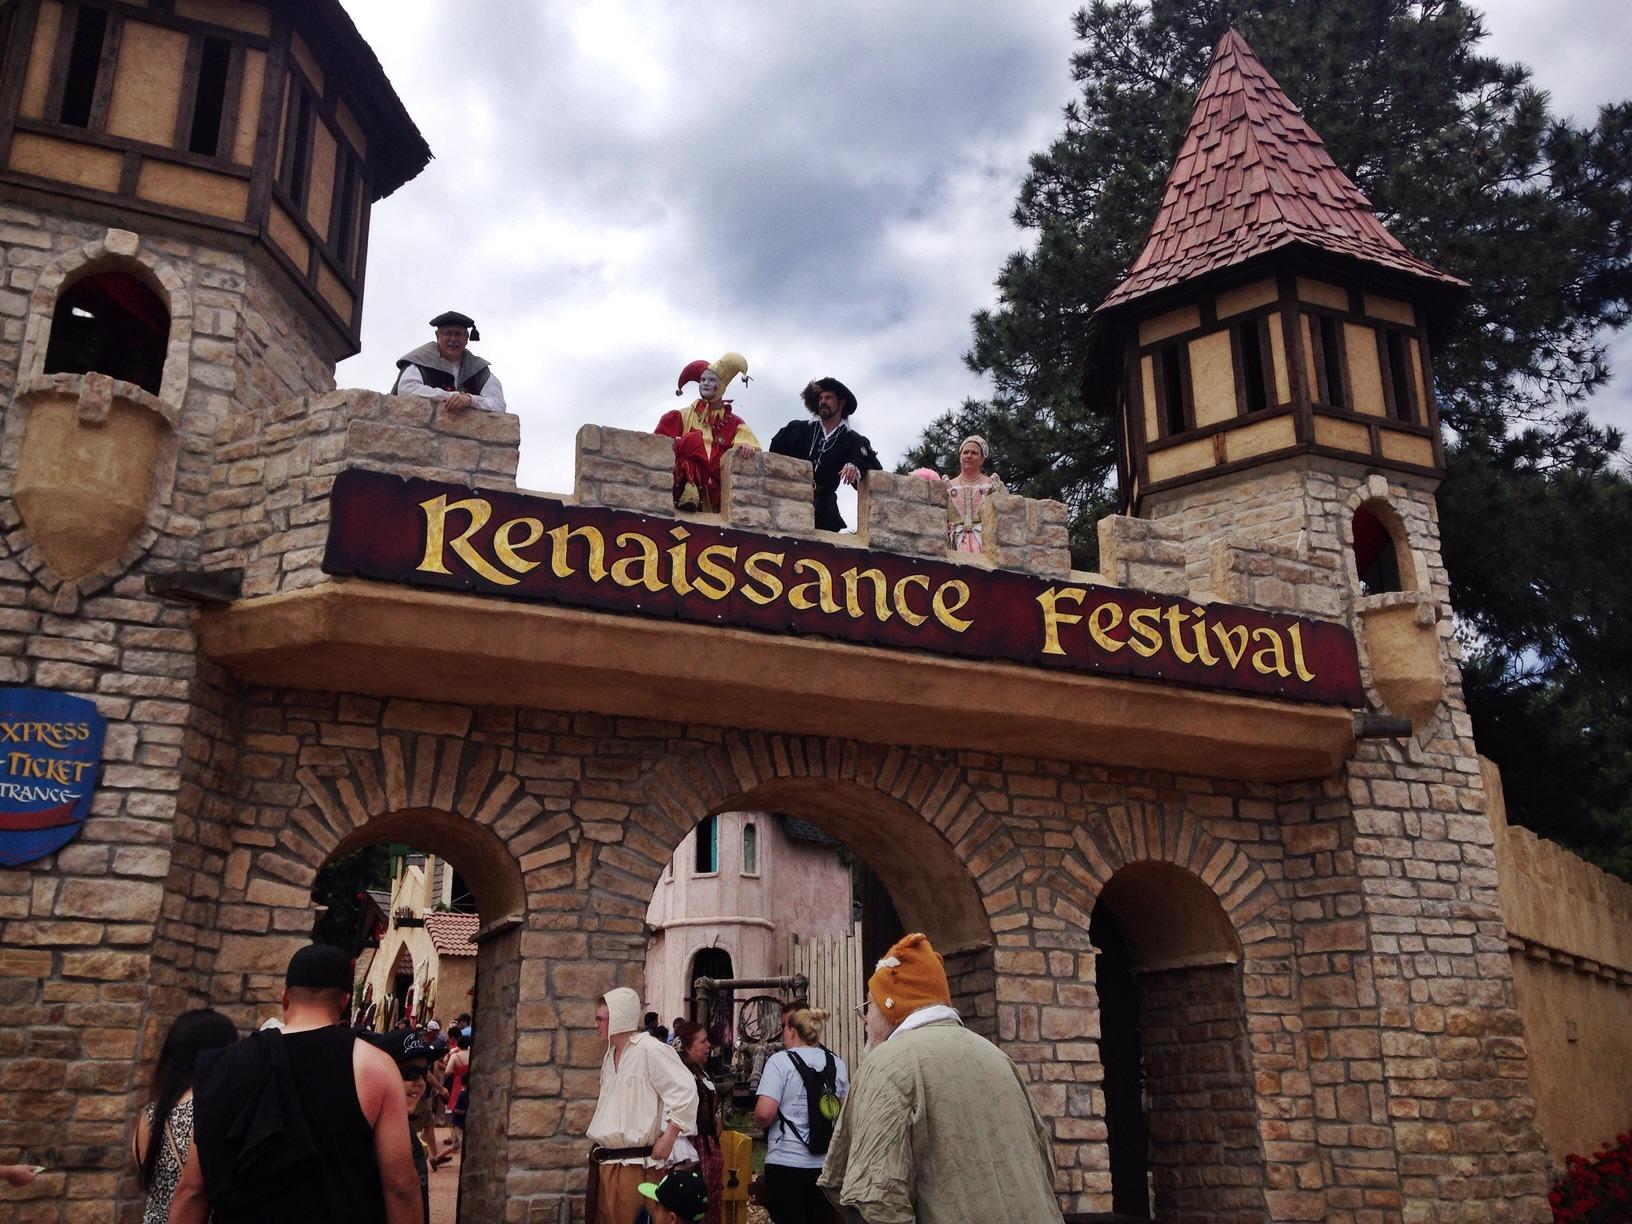 Colorado Renaissance Festival 2020.5 Ways To Make The Most Of The Renaissance Festival 5280